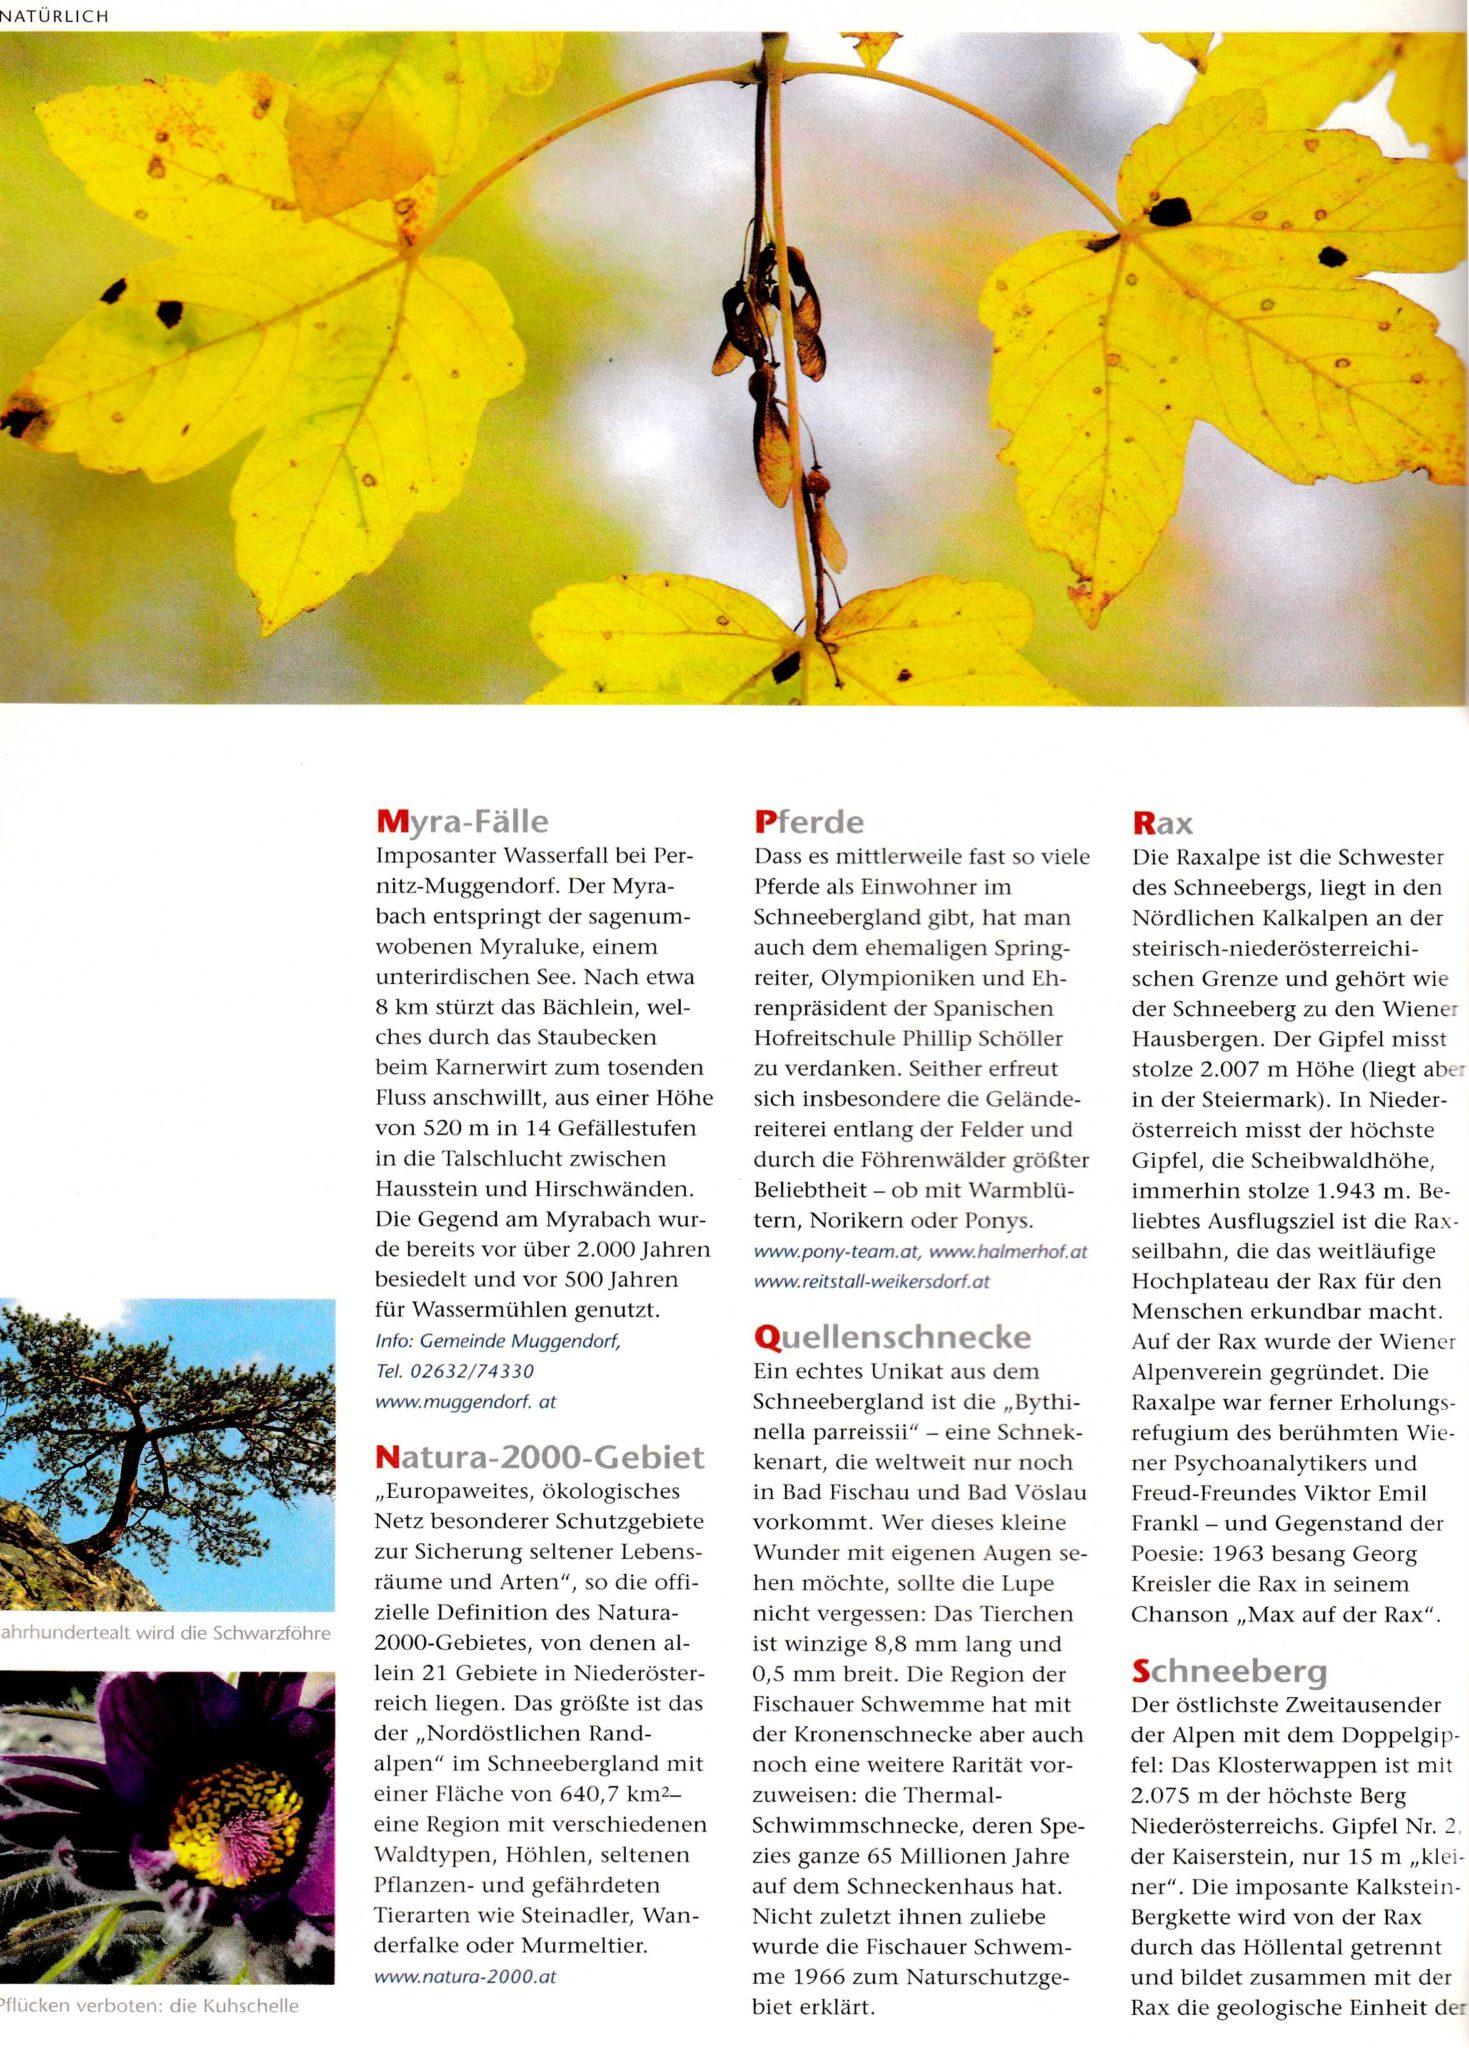 Tourismus NÖ, Naturlexikon | Idee, Konzept, Recherche, Bildredaktion, Text